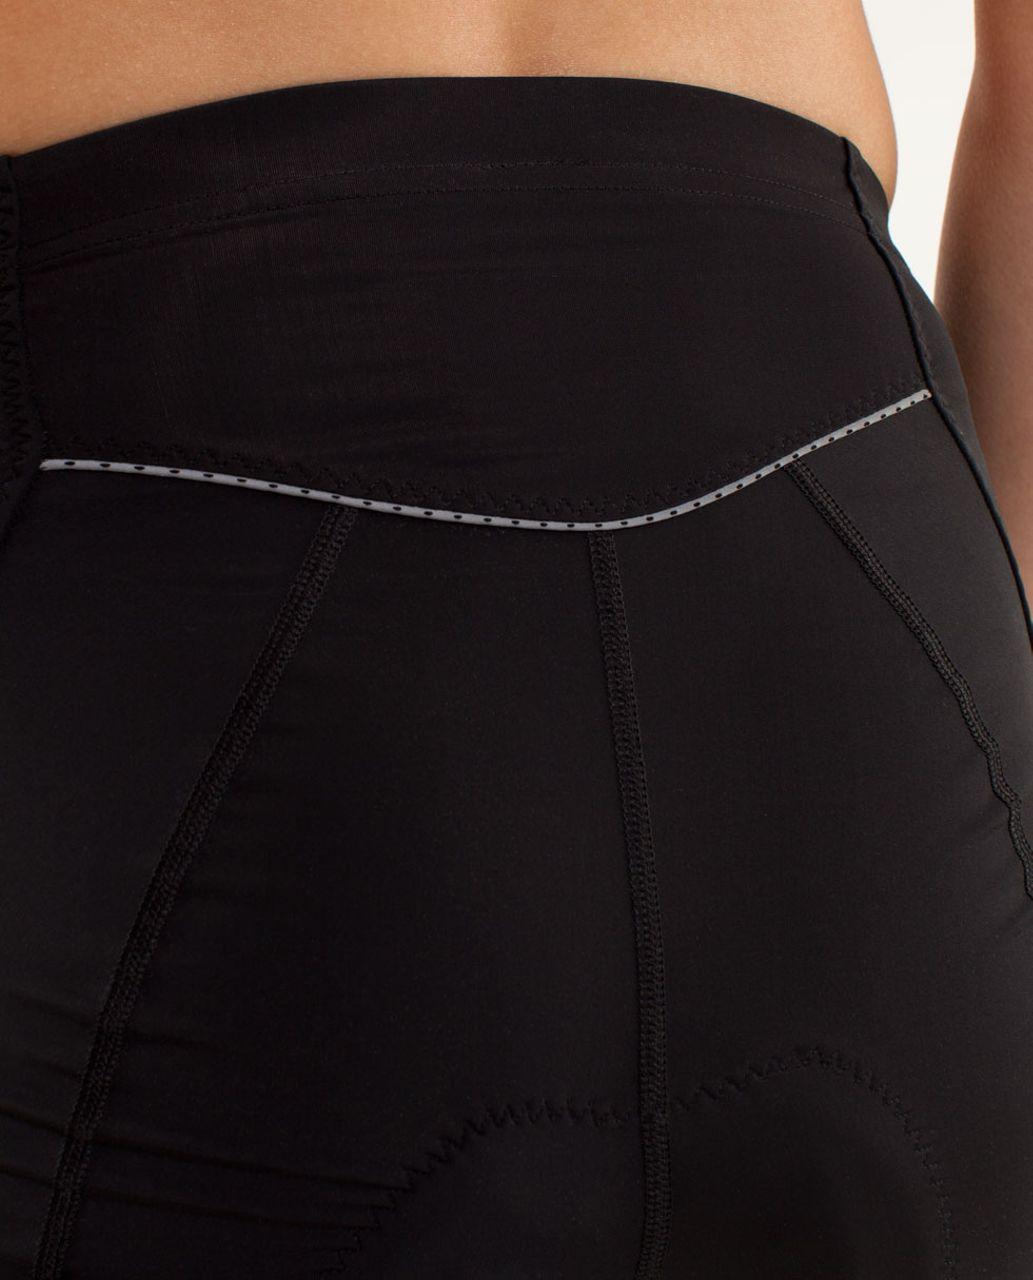 Lululemon Paceline Short - Black